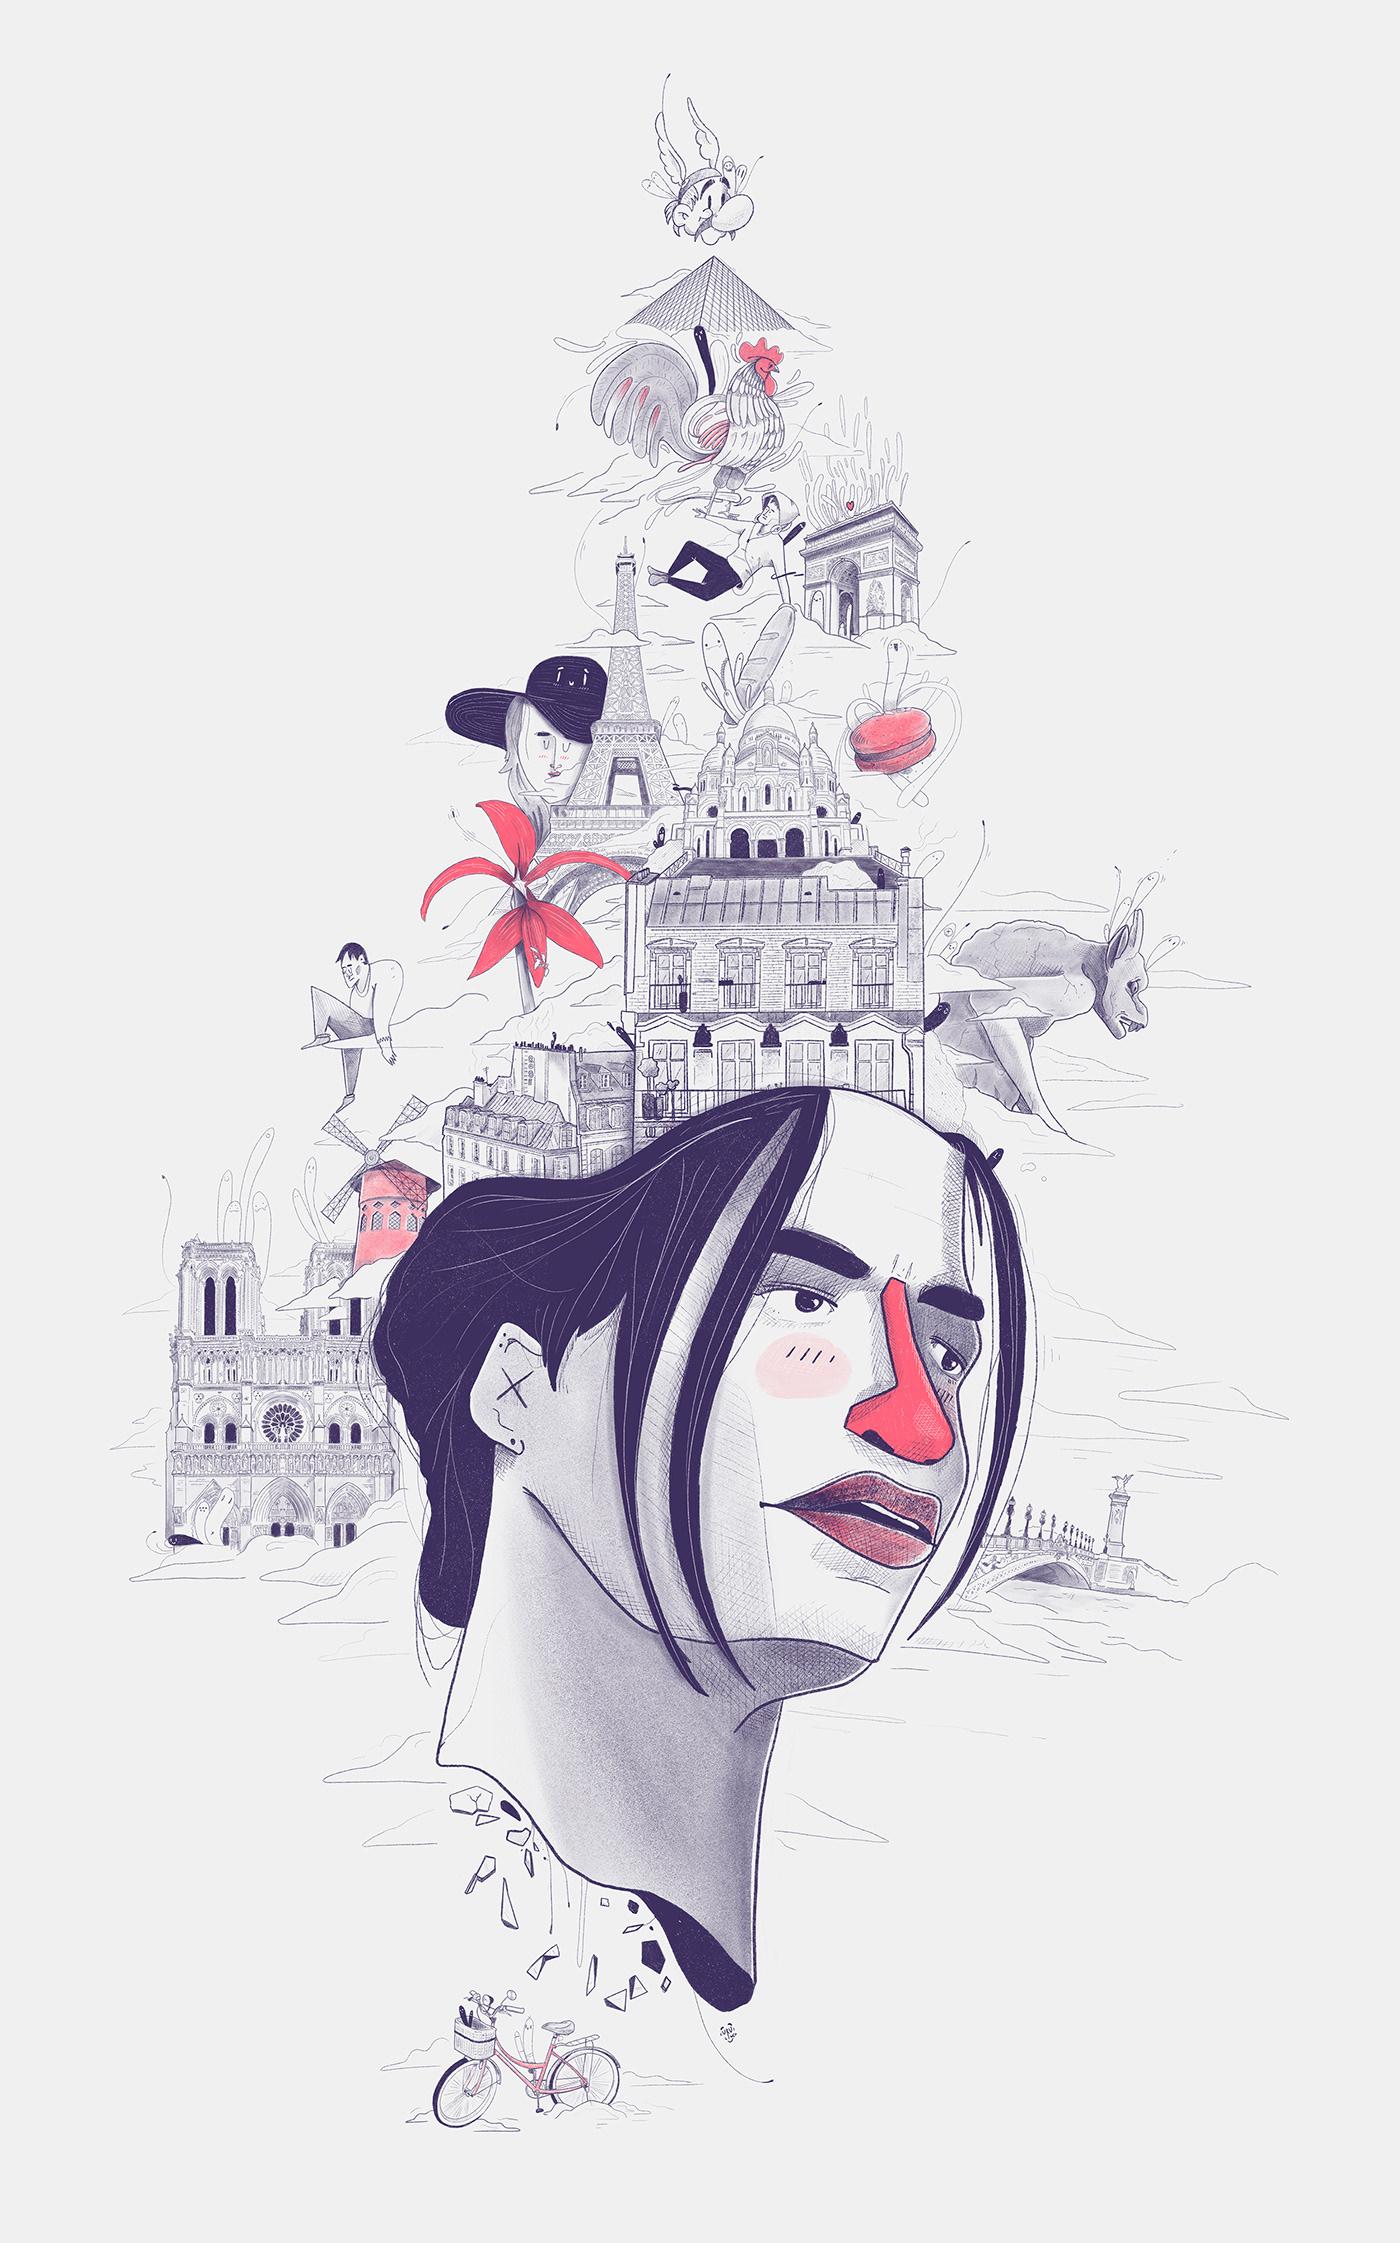 Board city decoration editorial icons ILLUSTRATION  Paris portrait